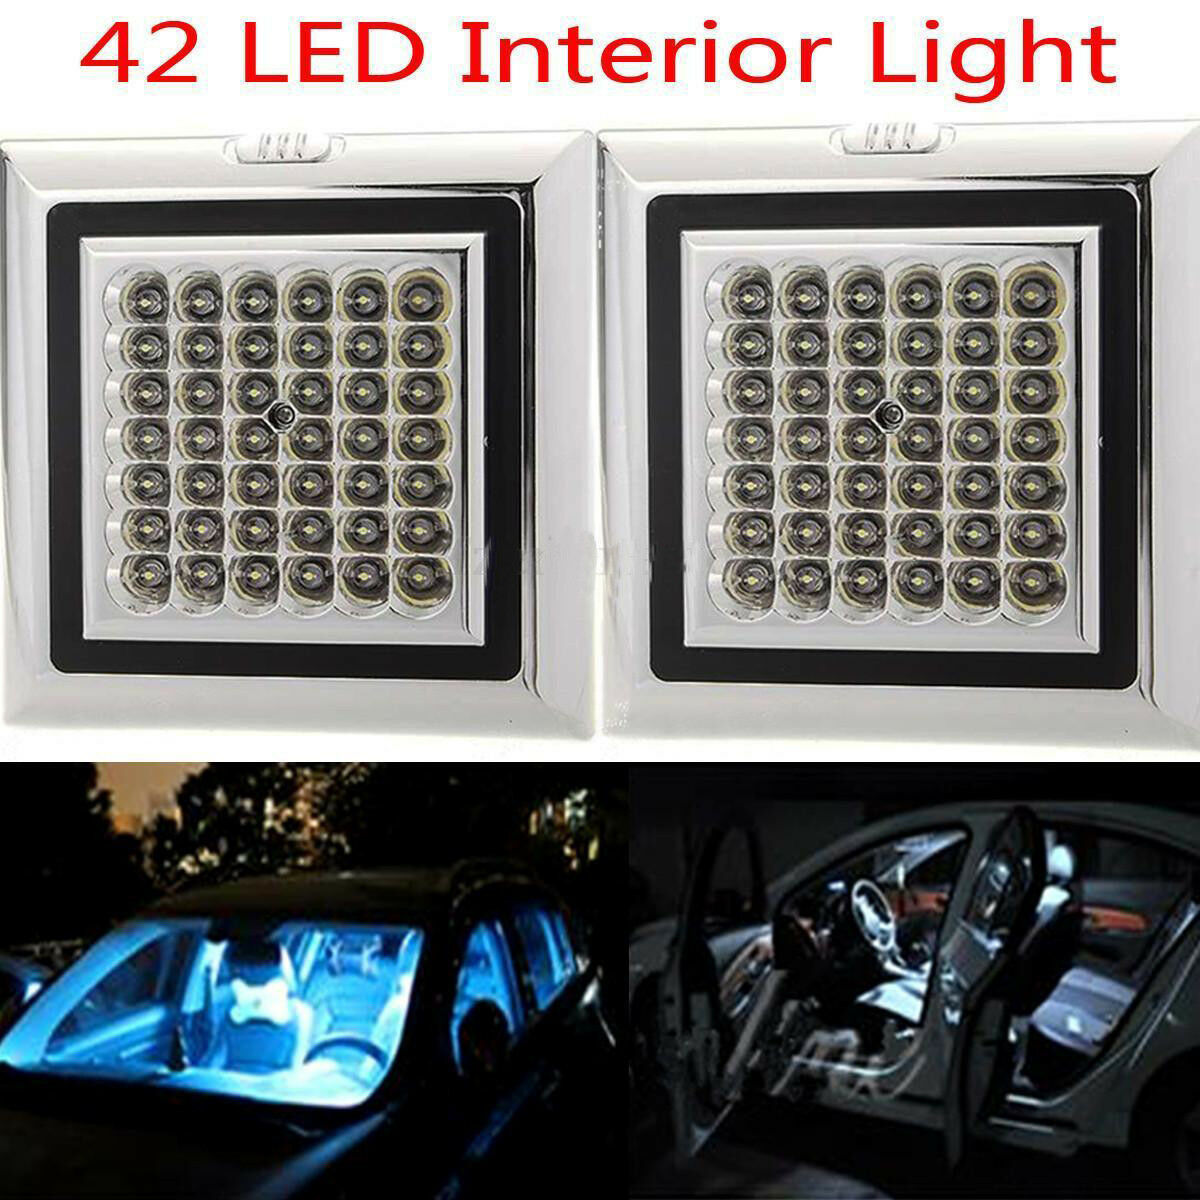 12v Volt 42 Led Car Truck Vehicle Auto Dome Roof Ceiling Interior Light Lamp New Ebay